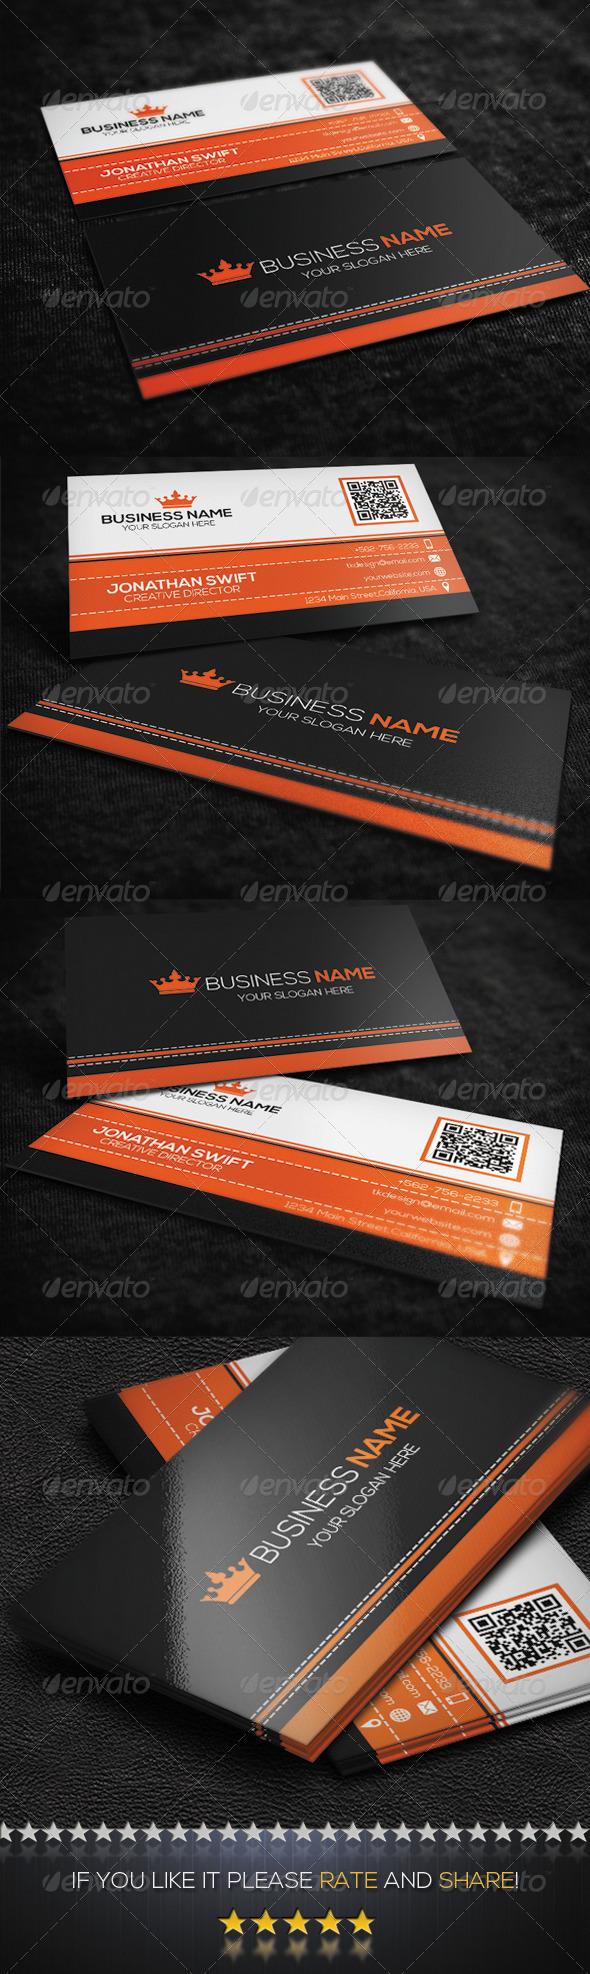 GraphicRiver Corporate Business Card No.06 8493807